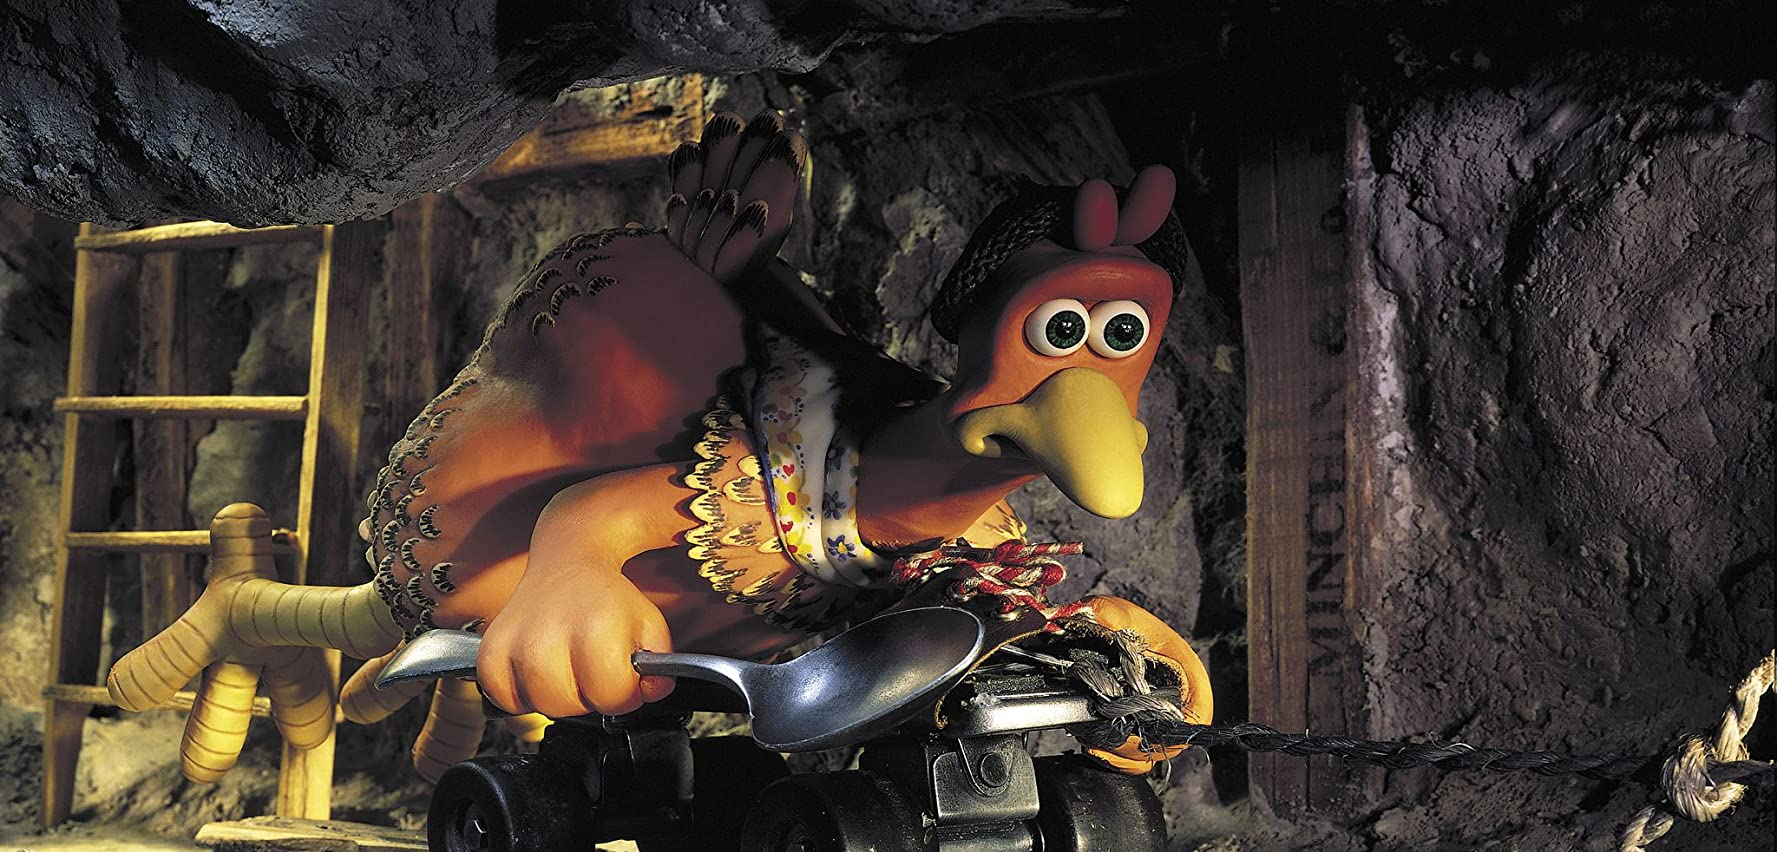 Julia Sawalha in Chicken Run (2000)